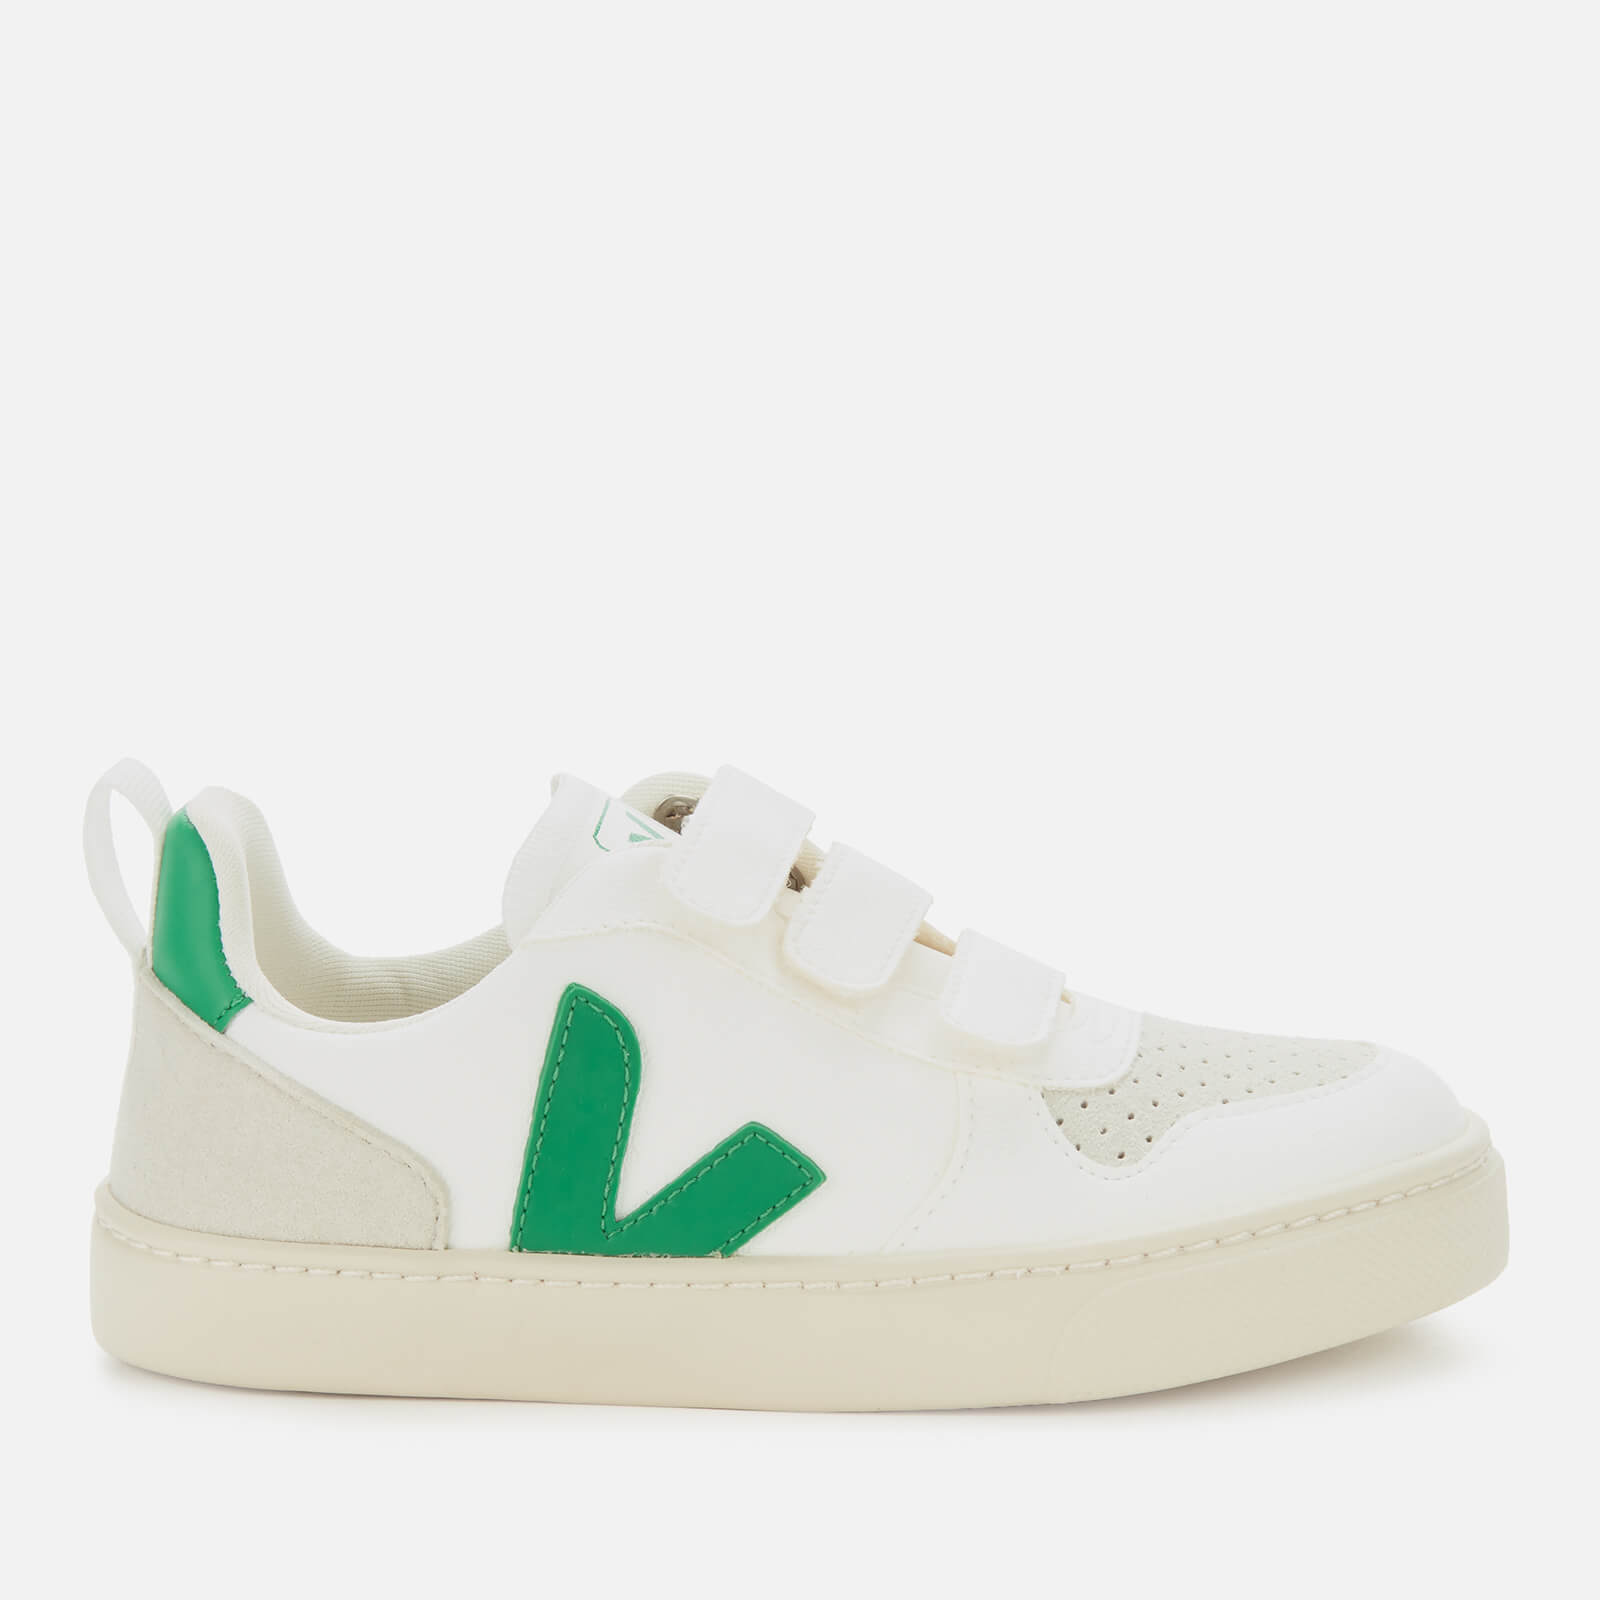 Veja Kid's V10 Velcro Leather Trainers - White/Emeraude - UK 1.5 Kids